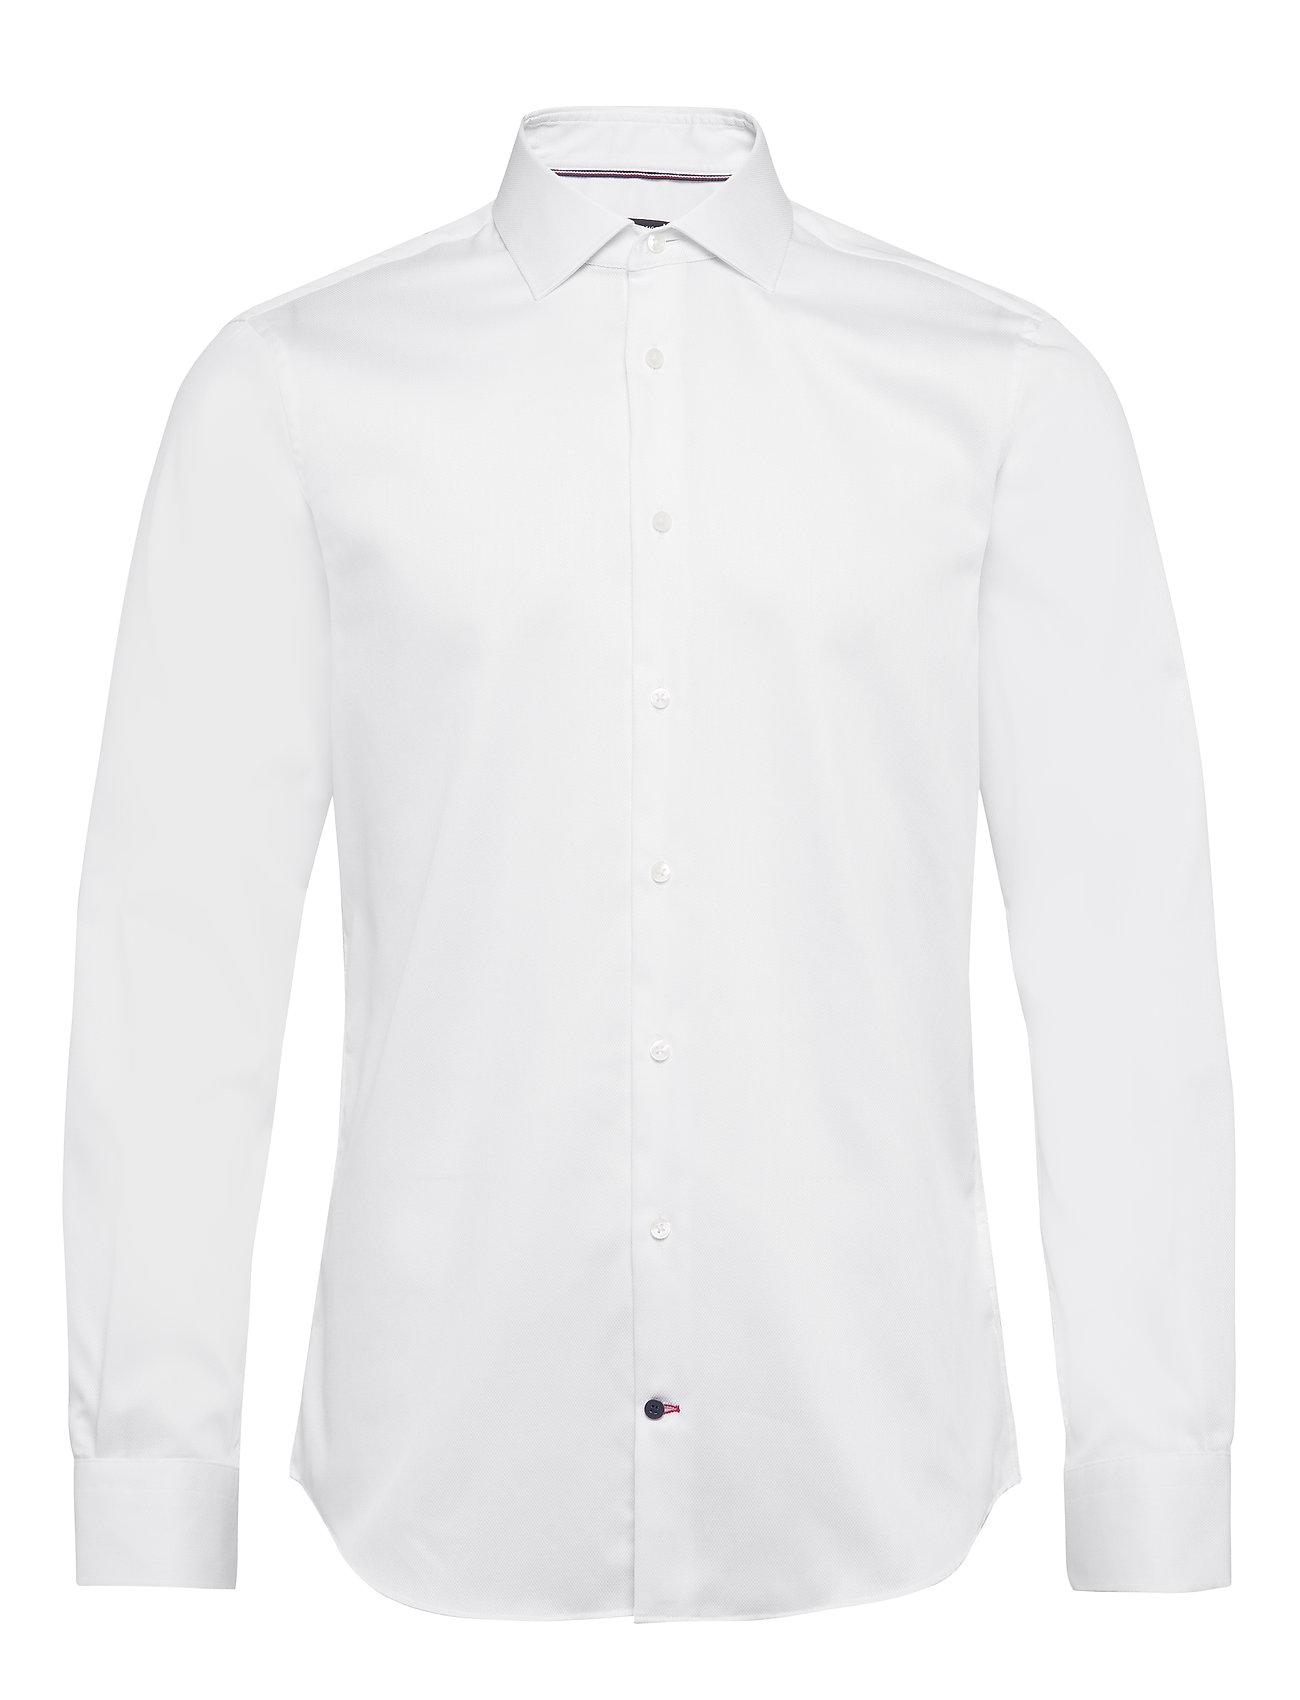 Tommy Hilfiger Tailored DOBBY FLEX COLLAR SLIM SHIRT - WHITE